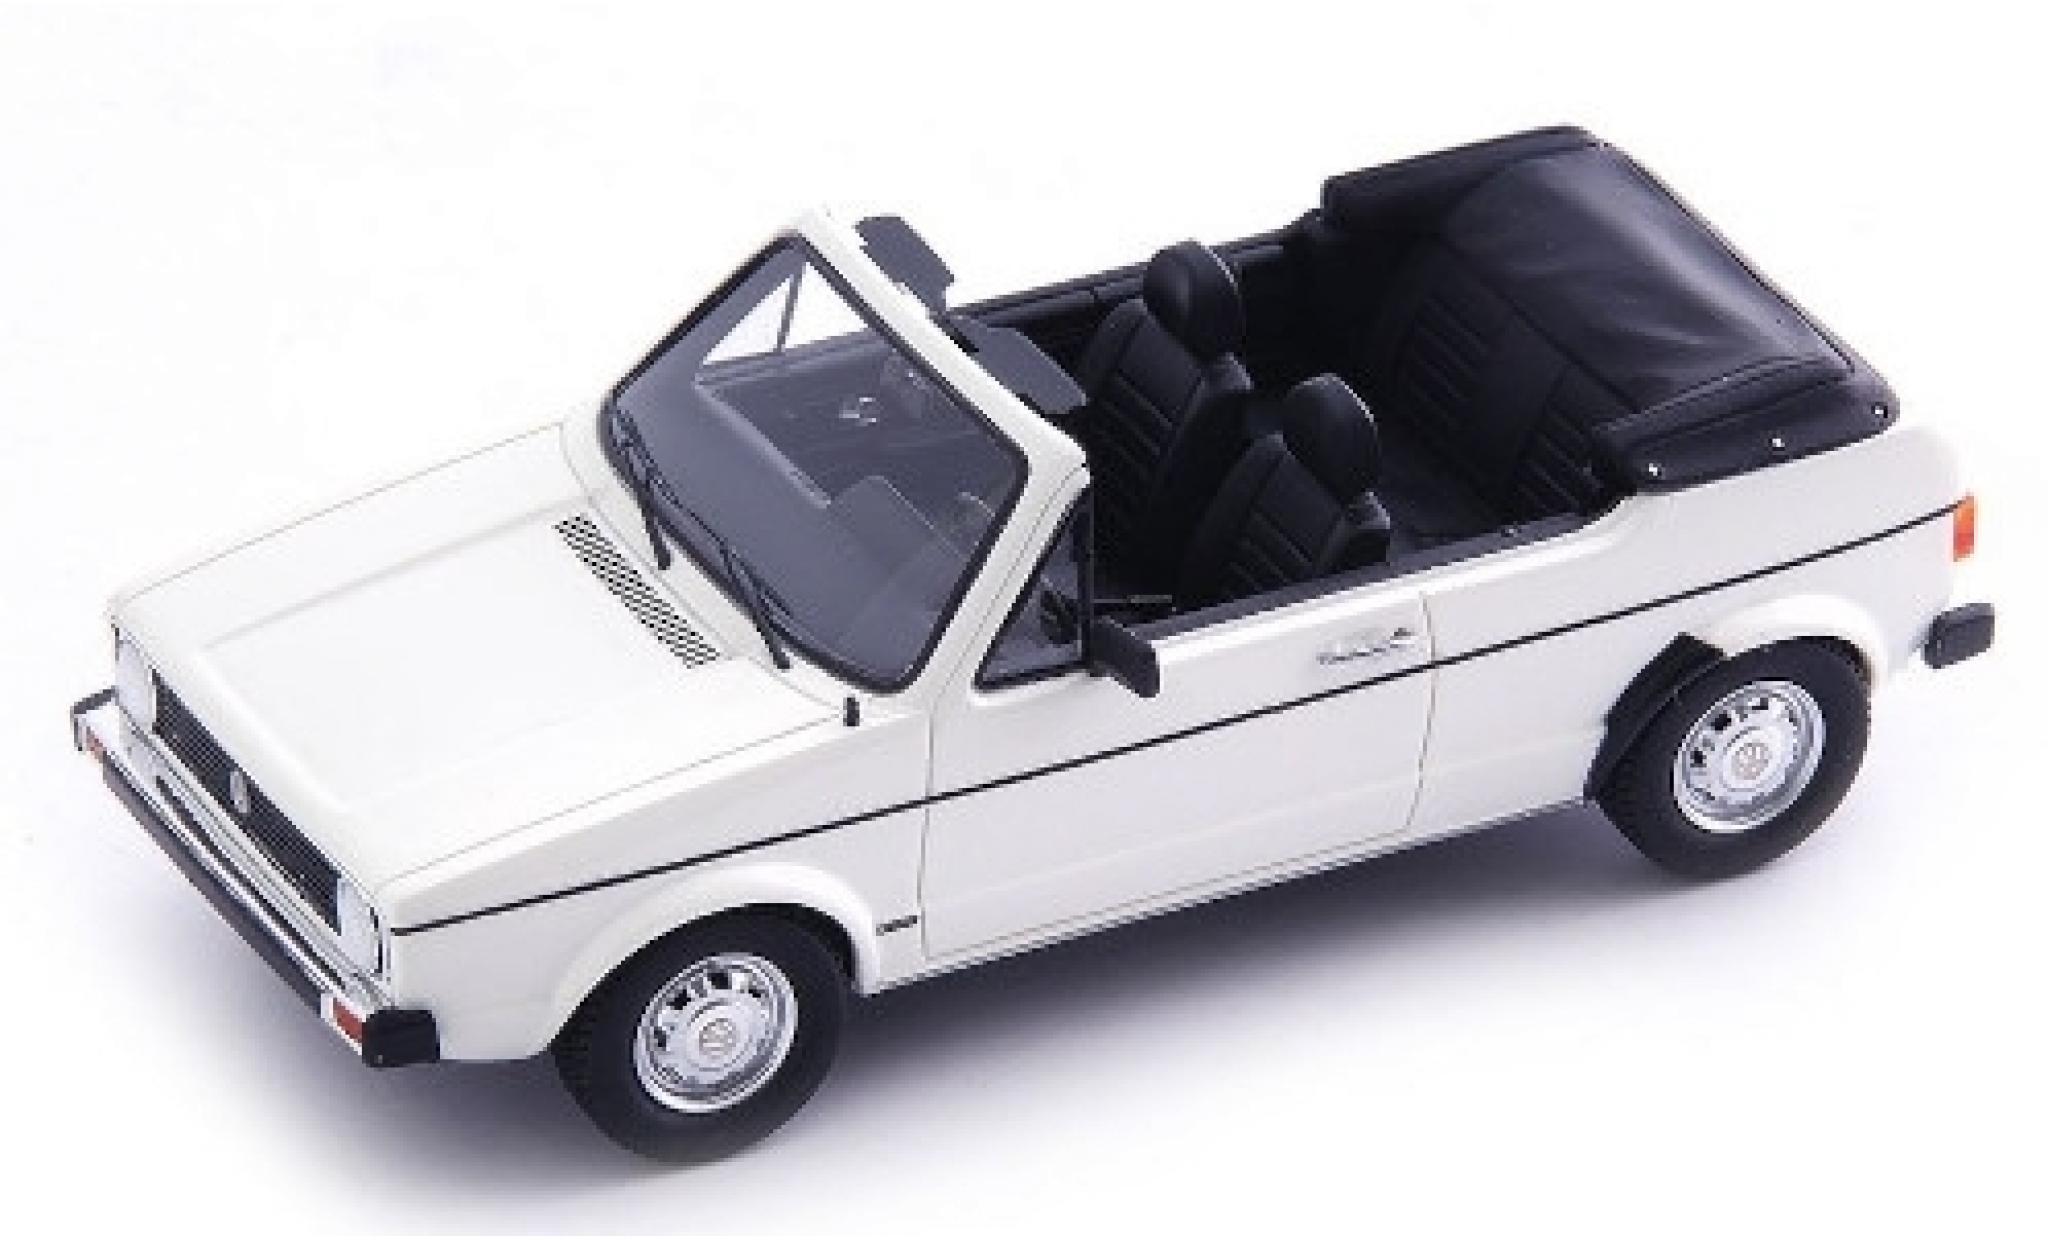 Volkswagen Golf 1/43 AutoCult I Cabriolet Prougeotyp blanche 1976